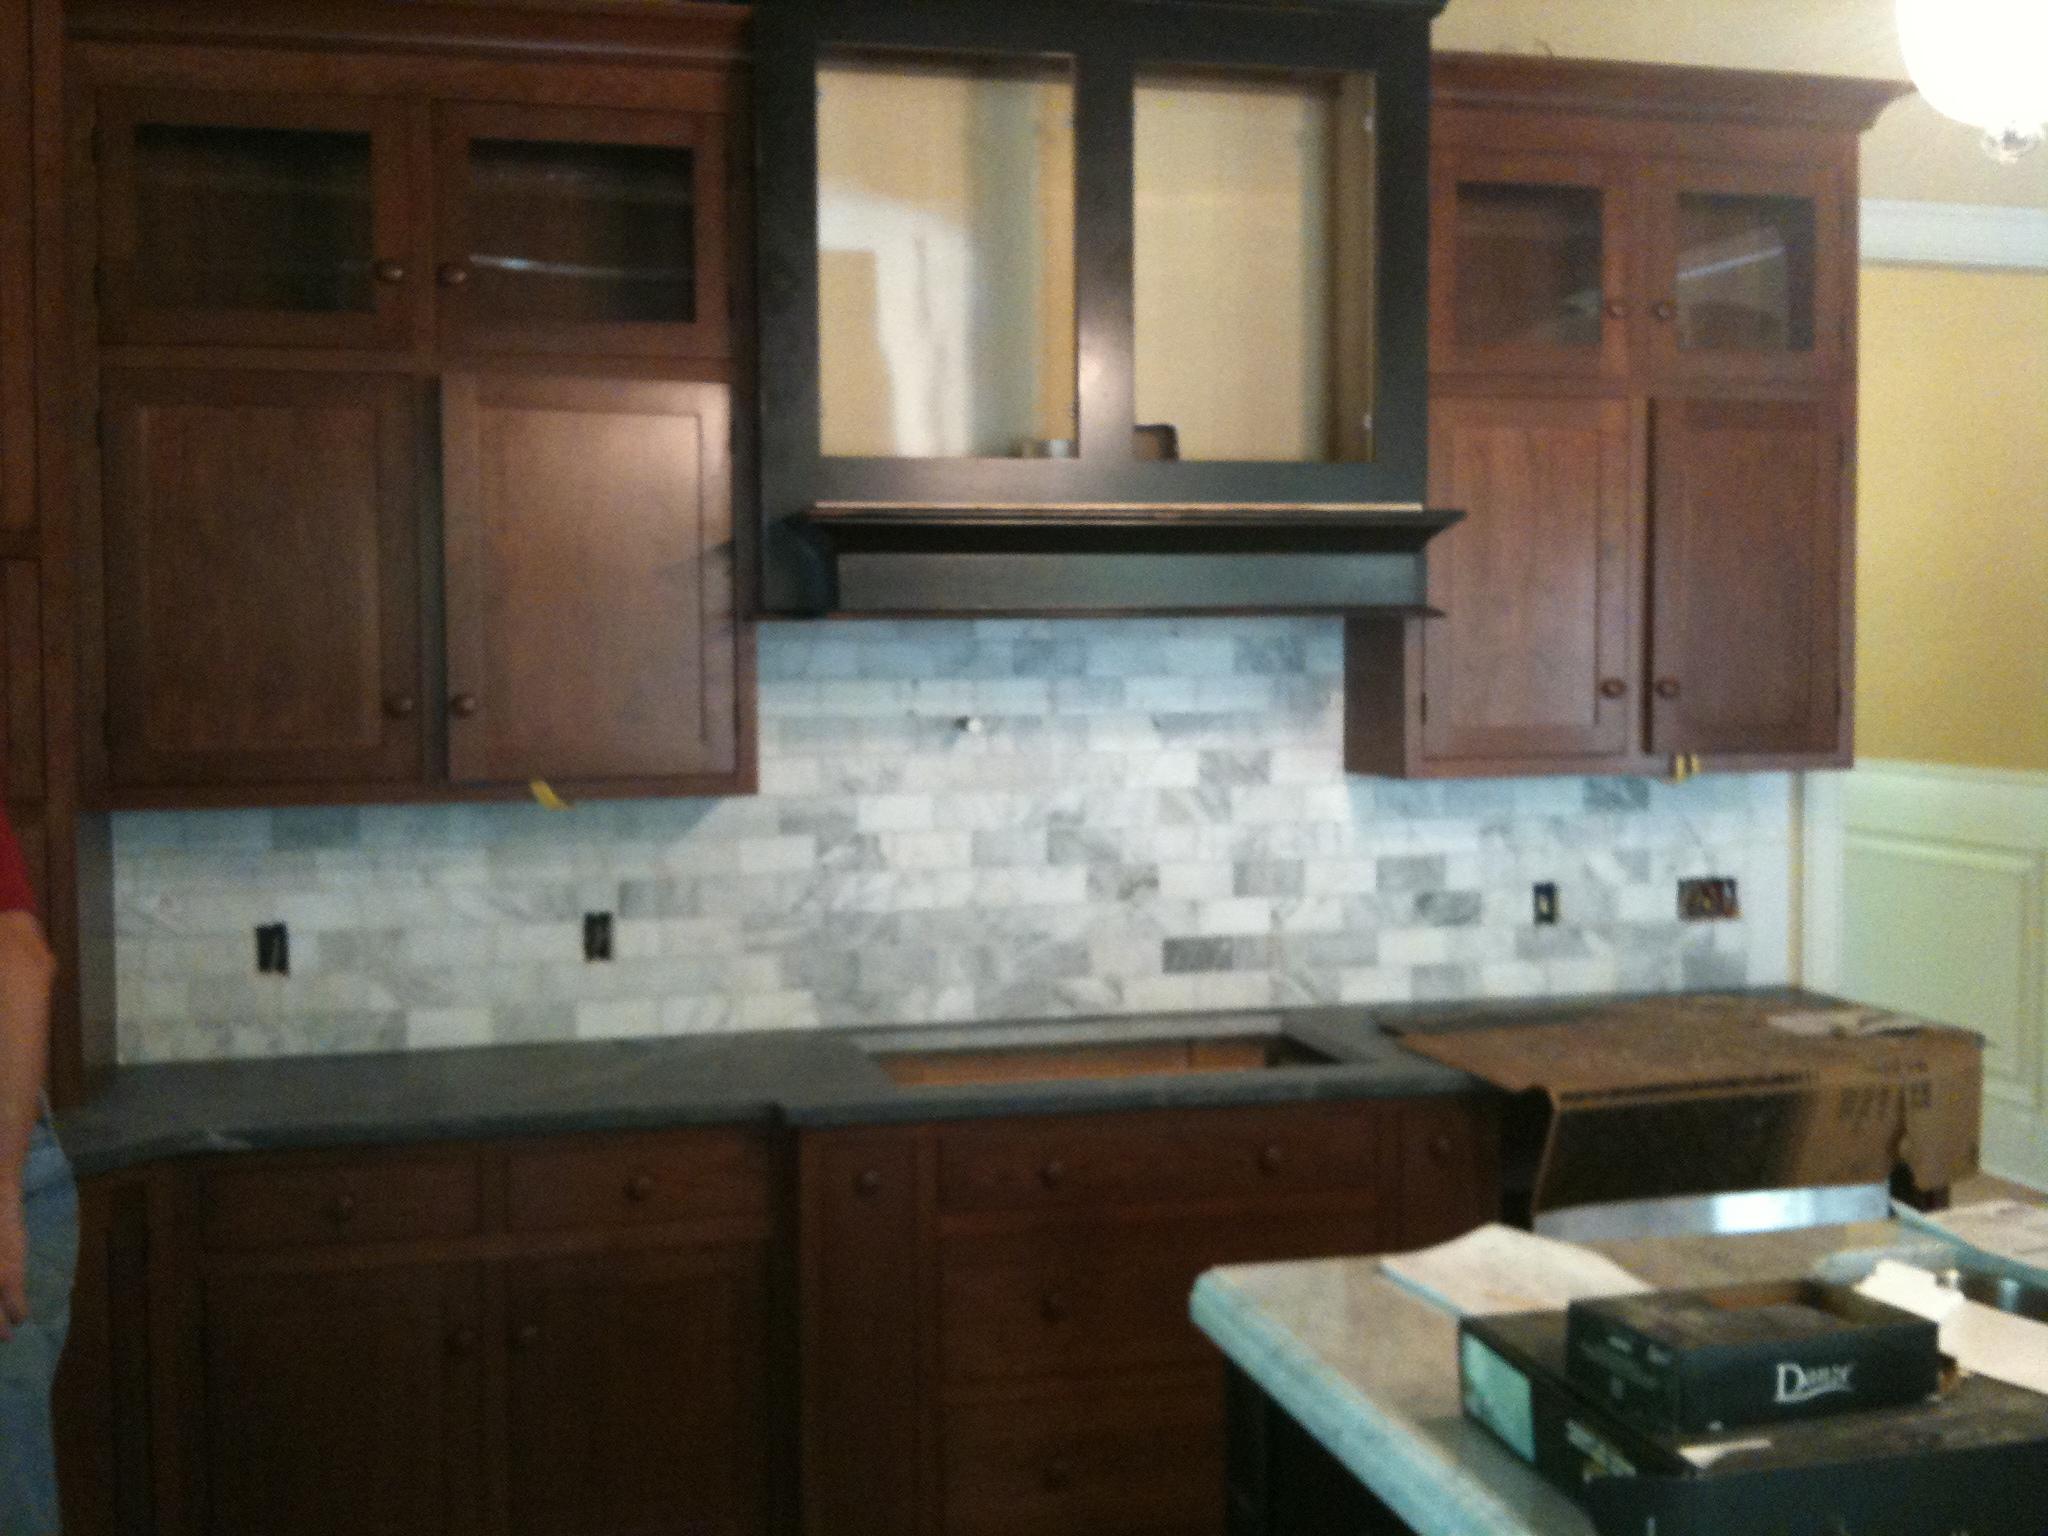 kitchen design kitchen remodeling atlanta ga kitchen remodeling contractor in Atlanta